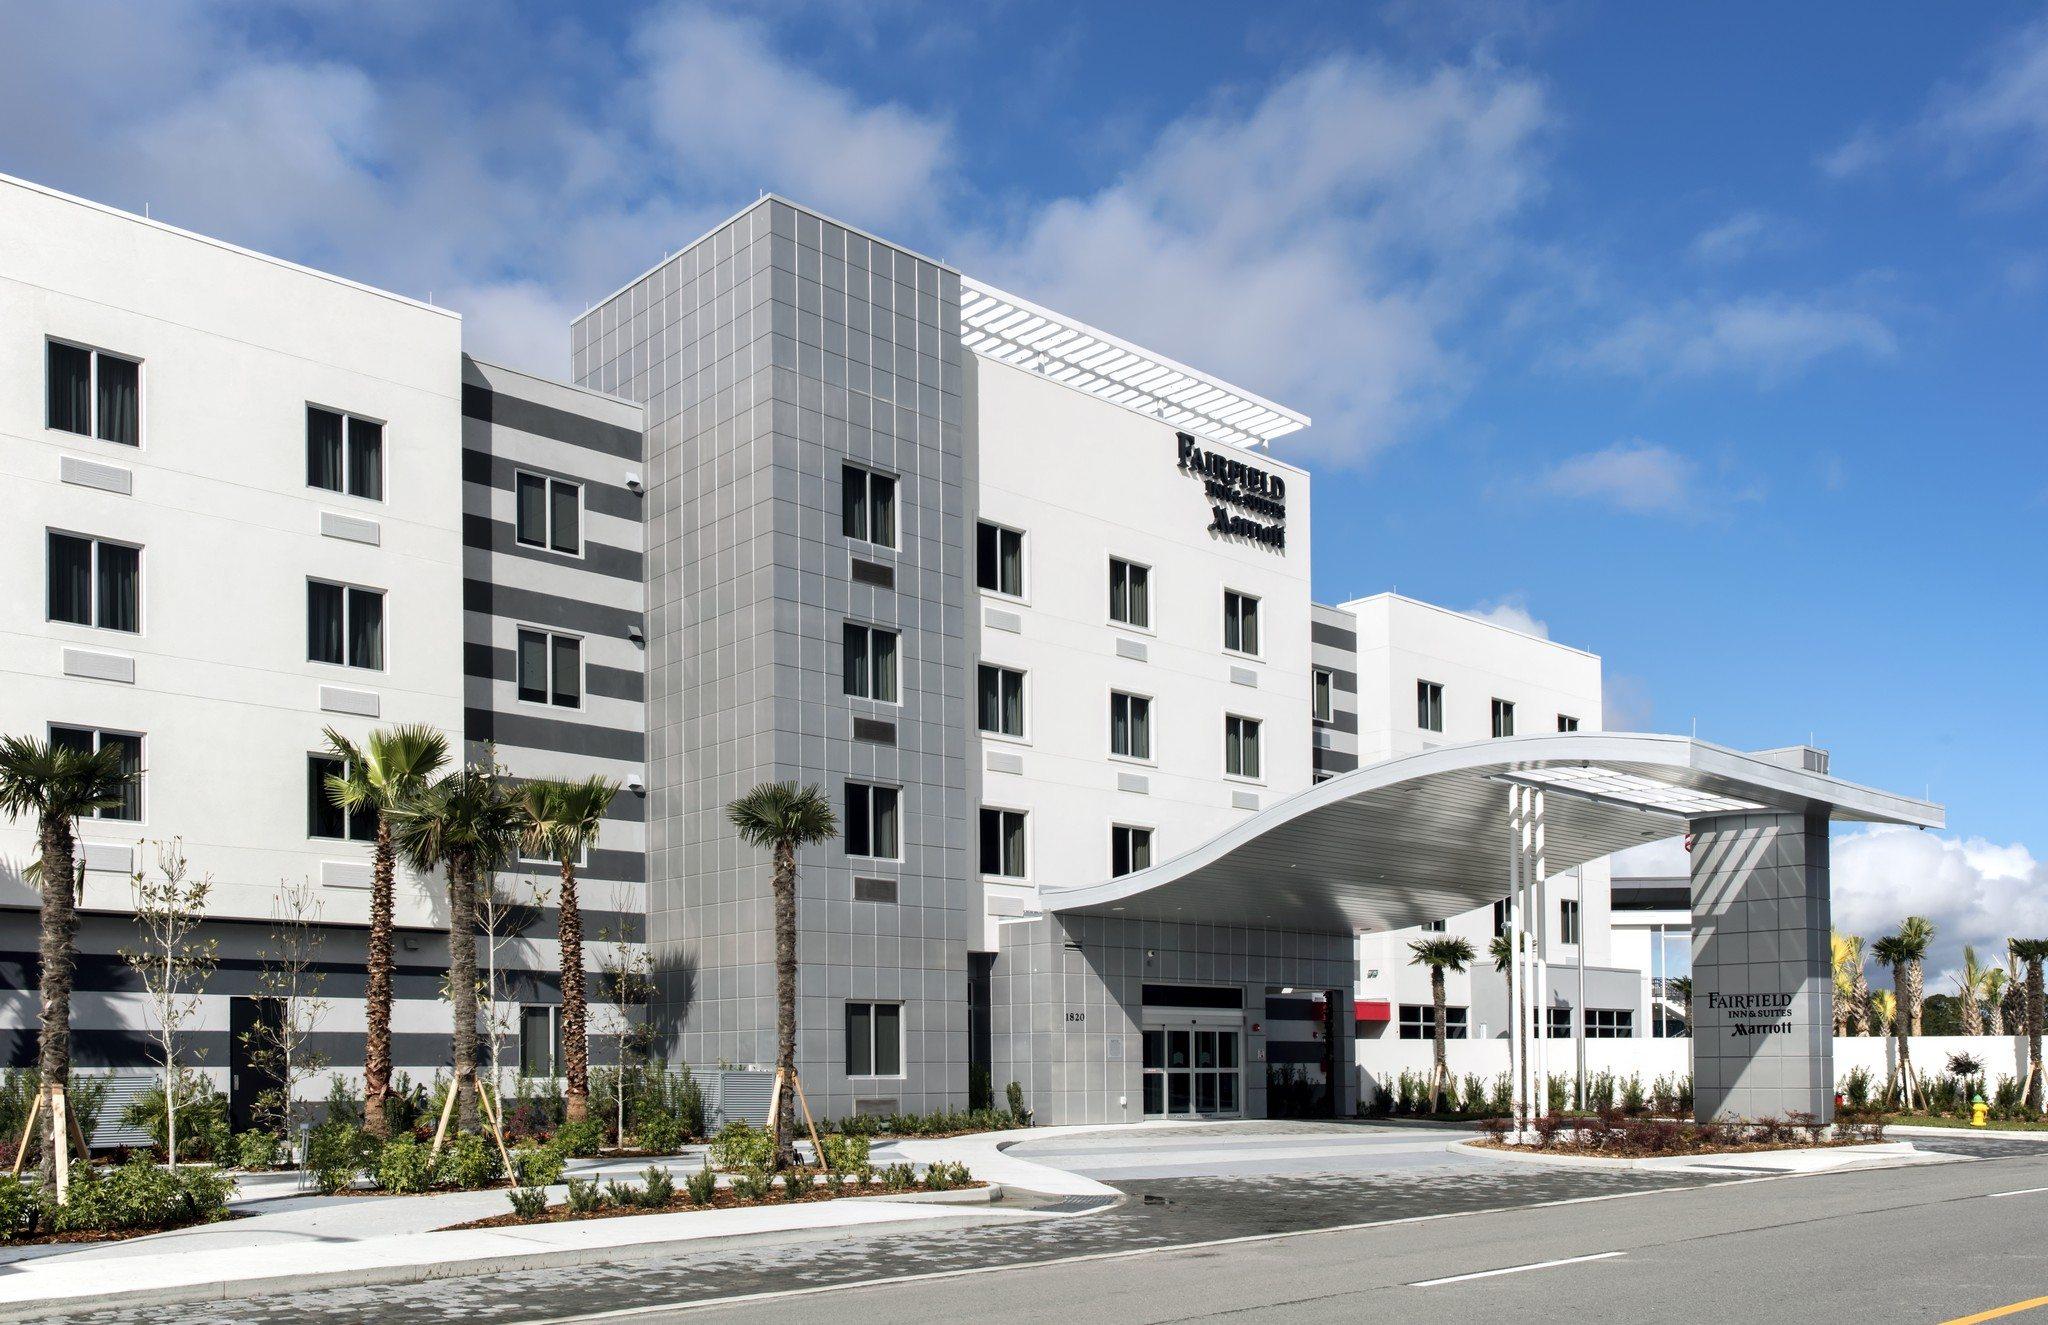 Make Your Daytona Vacation a Winner at the Fairfield Inn & Suites Daytona Beach Speedway/Airport